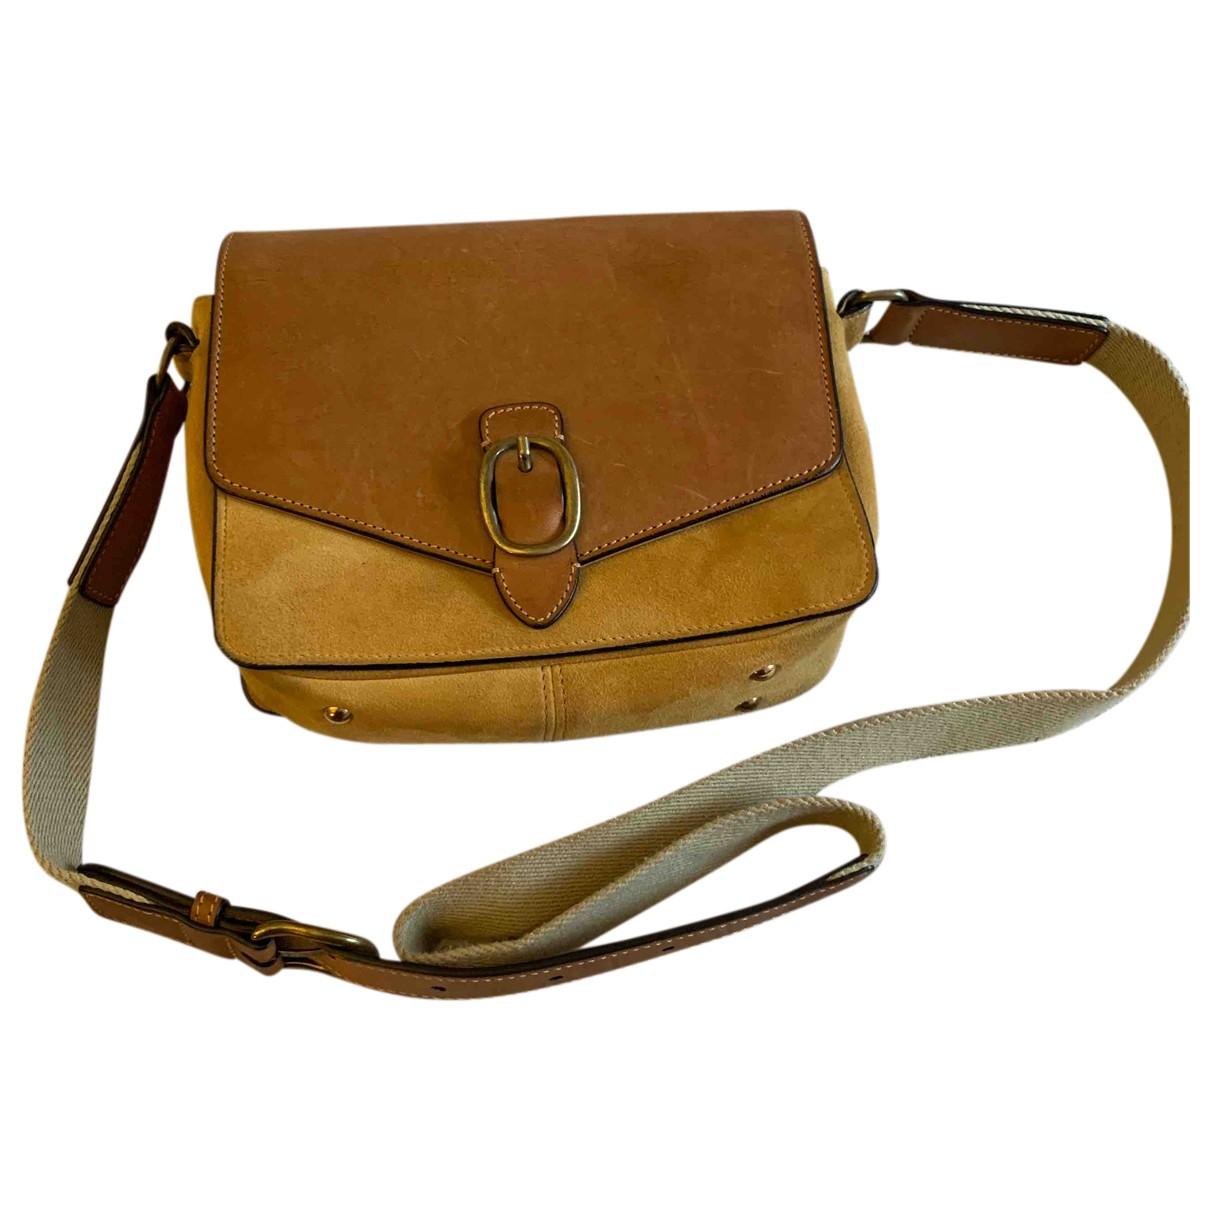 Isabel Marant N Yellow Leather handbag for Women N